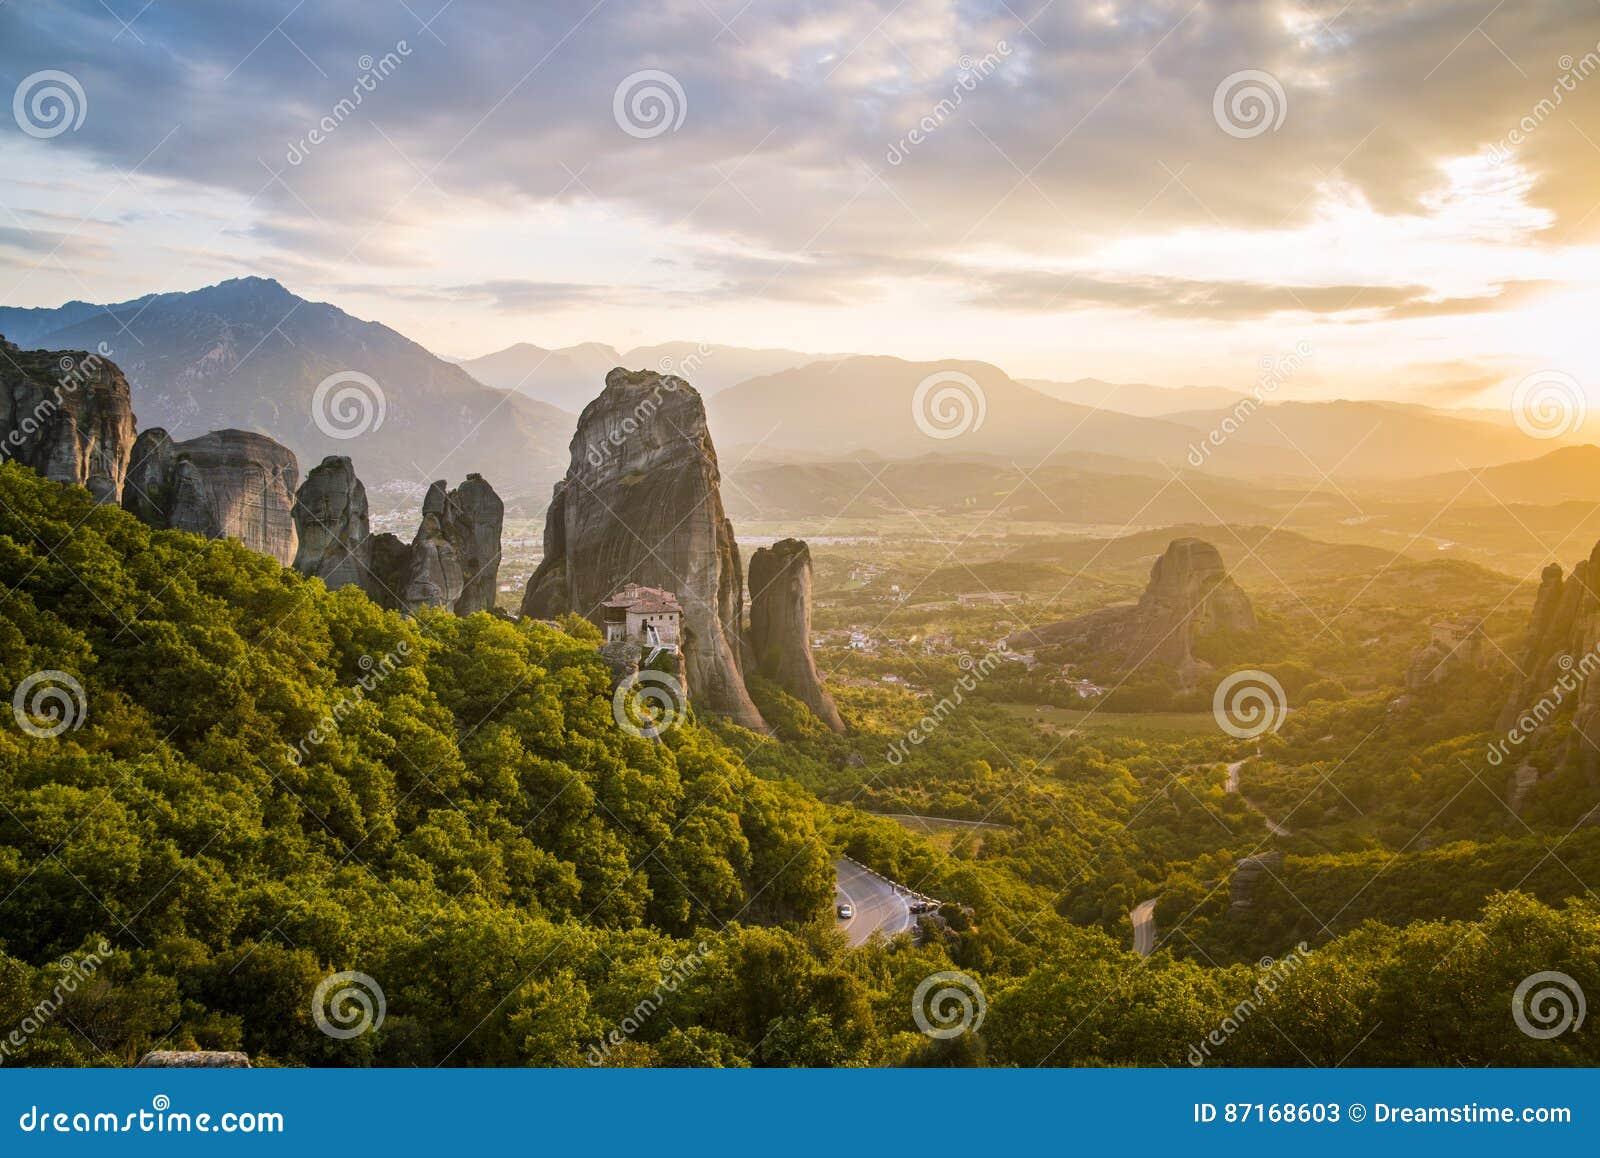 Rock Cliffs of Meteora Greece